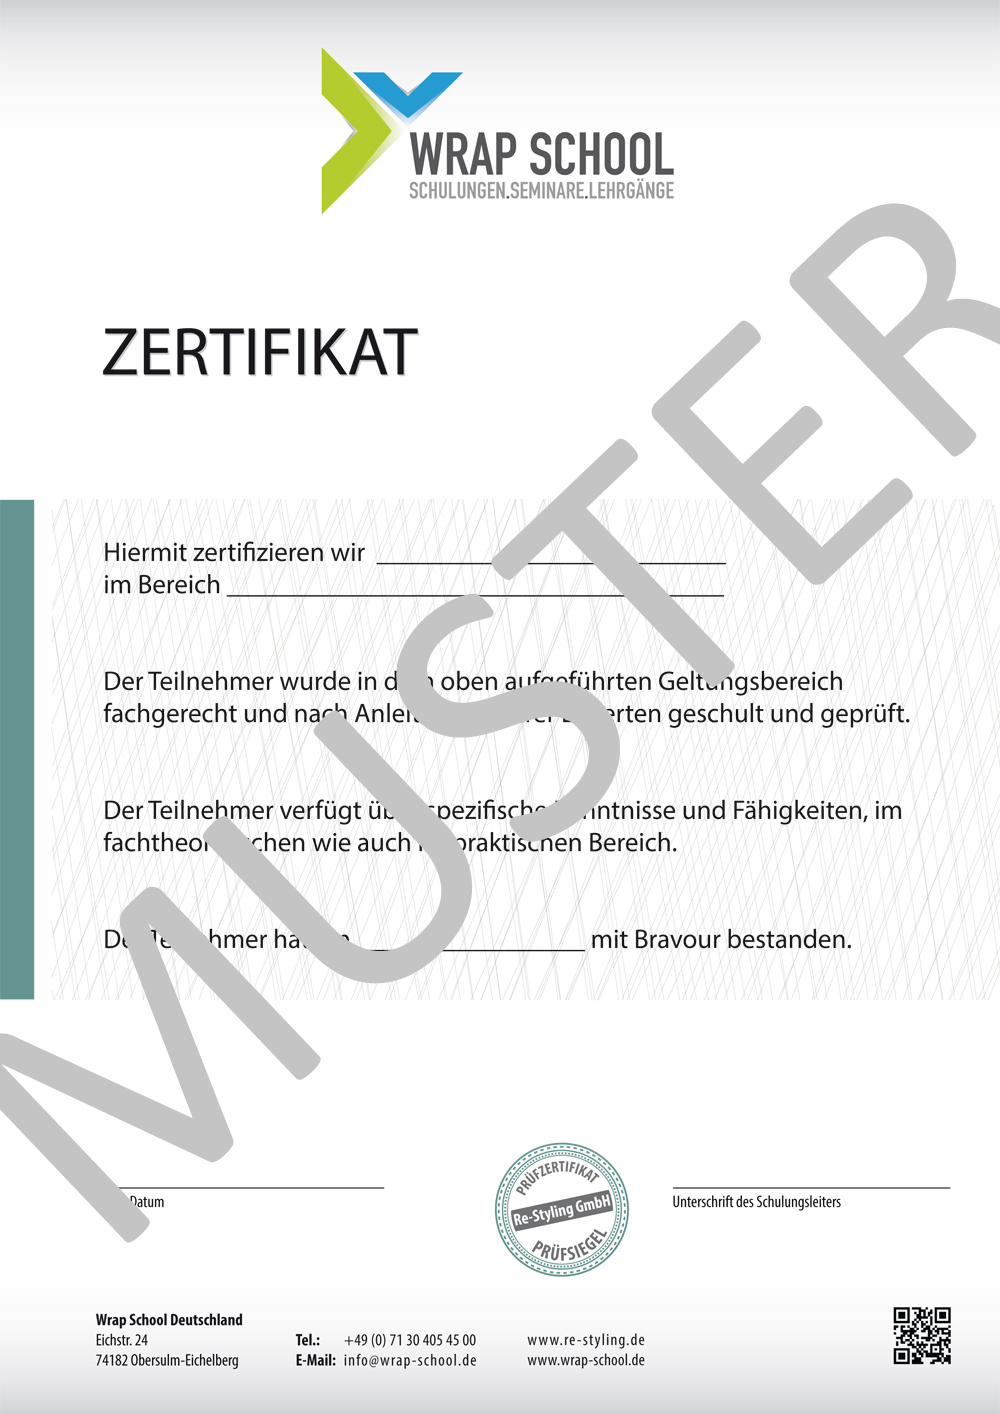 zertifizierung als car wrapper scheibent ner zertifikat in de at ch. Black Bedroom Furniture Sets. Home Design Ideas